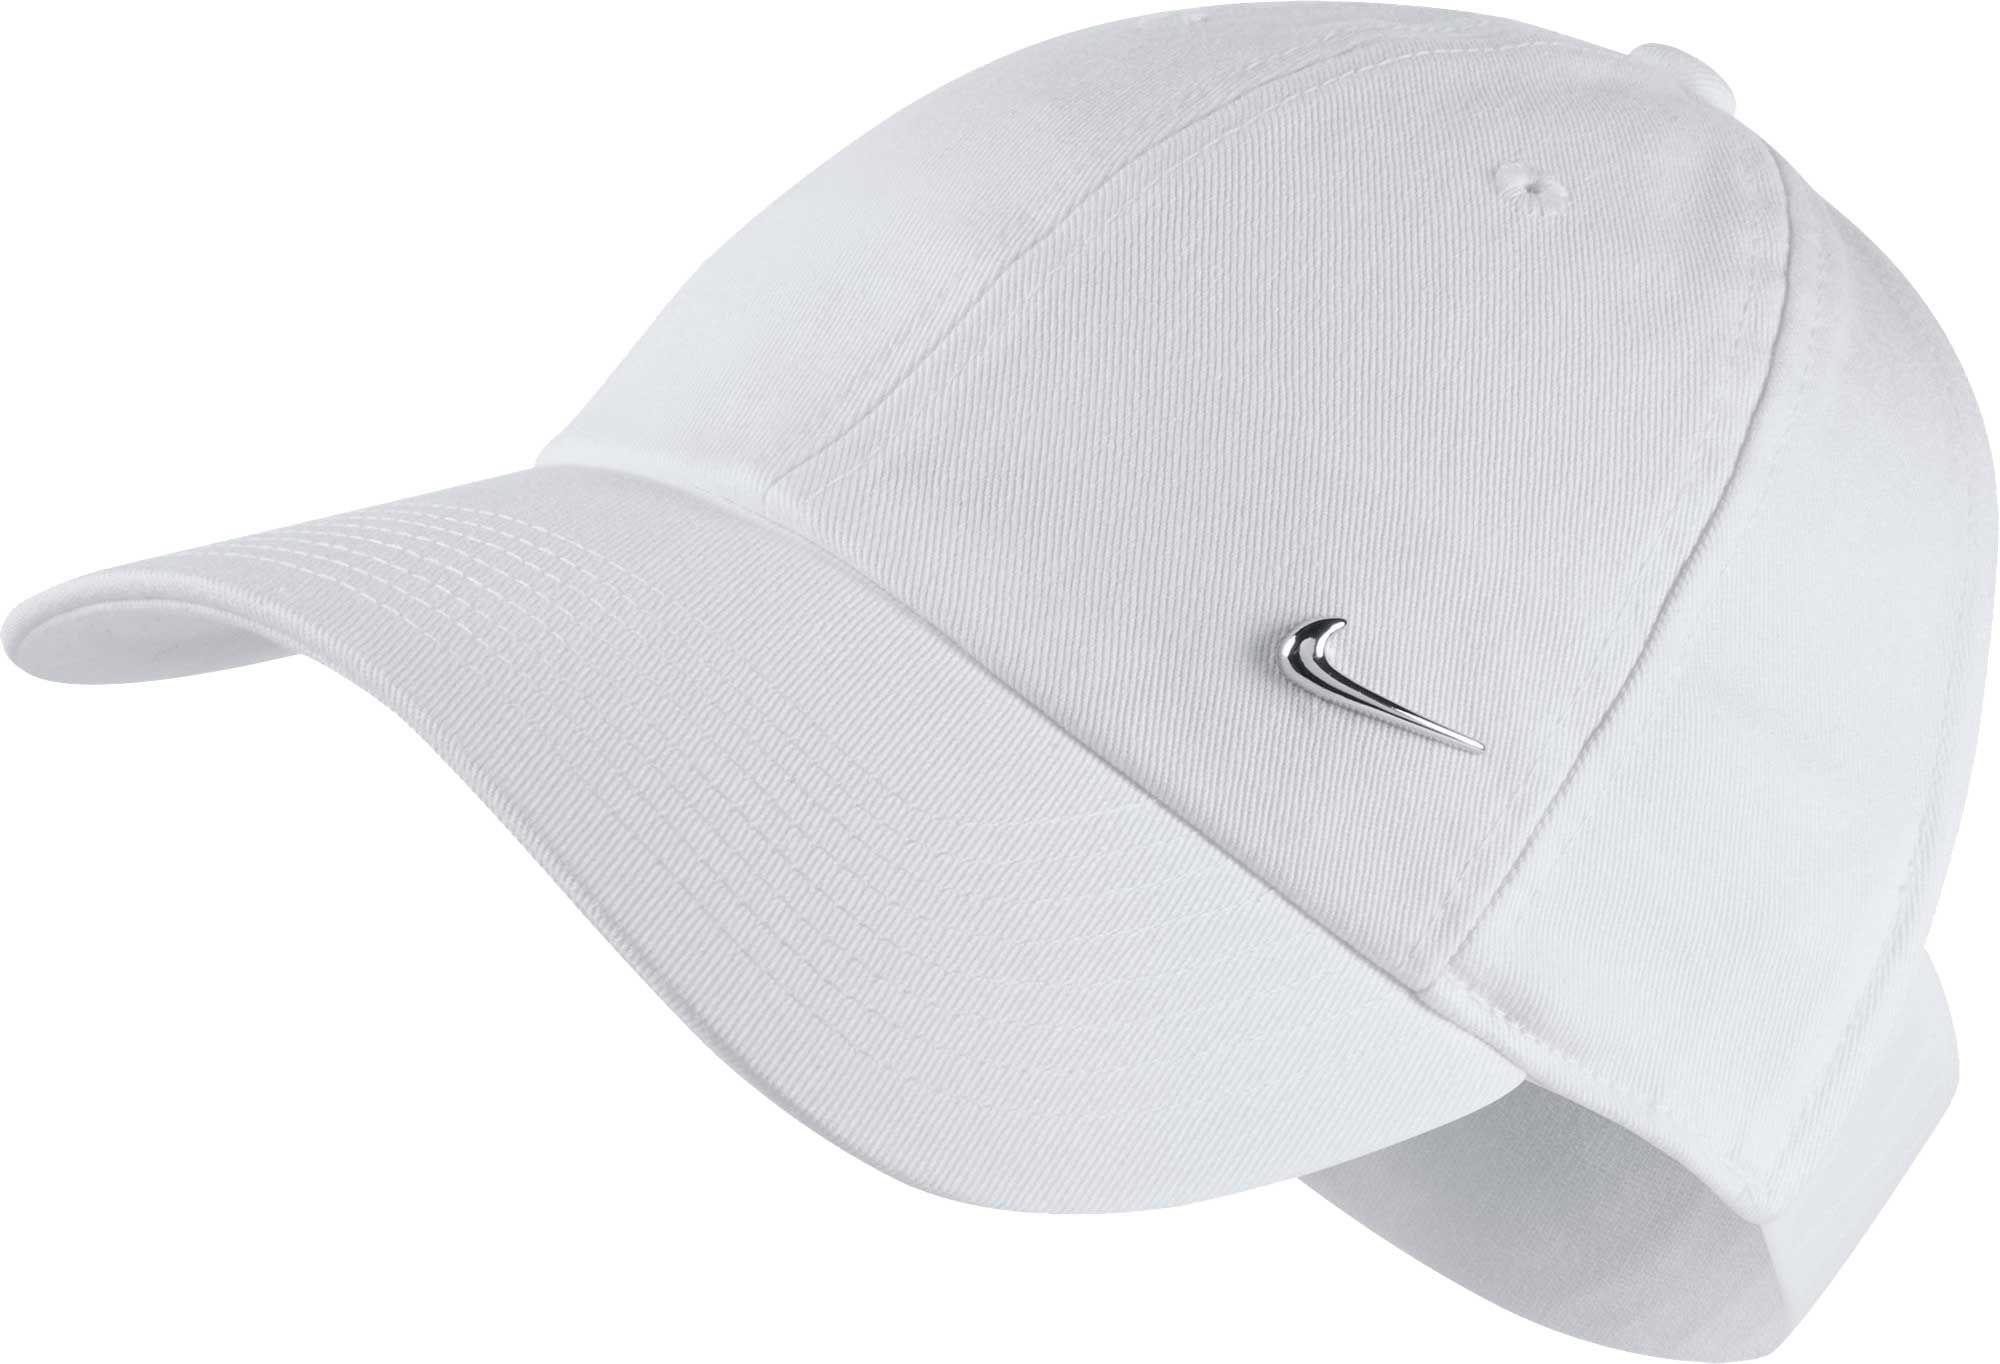 91eda717040e6 good image of nike aerobill running cap 49c8d 59ce0  new arrivals lyst nike  sportswear open back visor hat in white 2b6c8 df88e